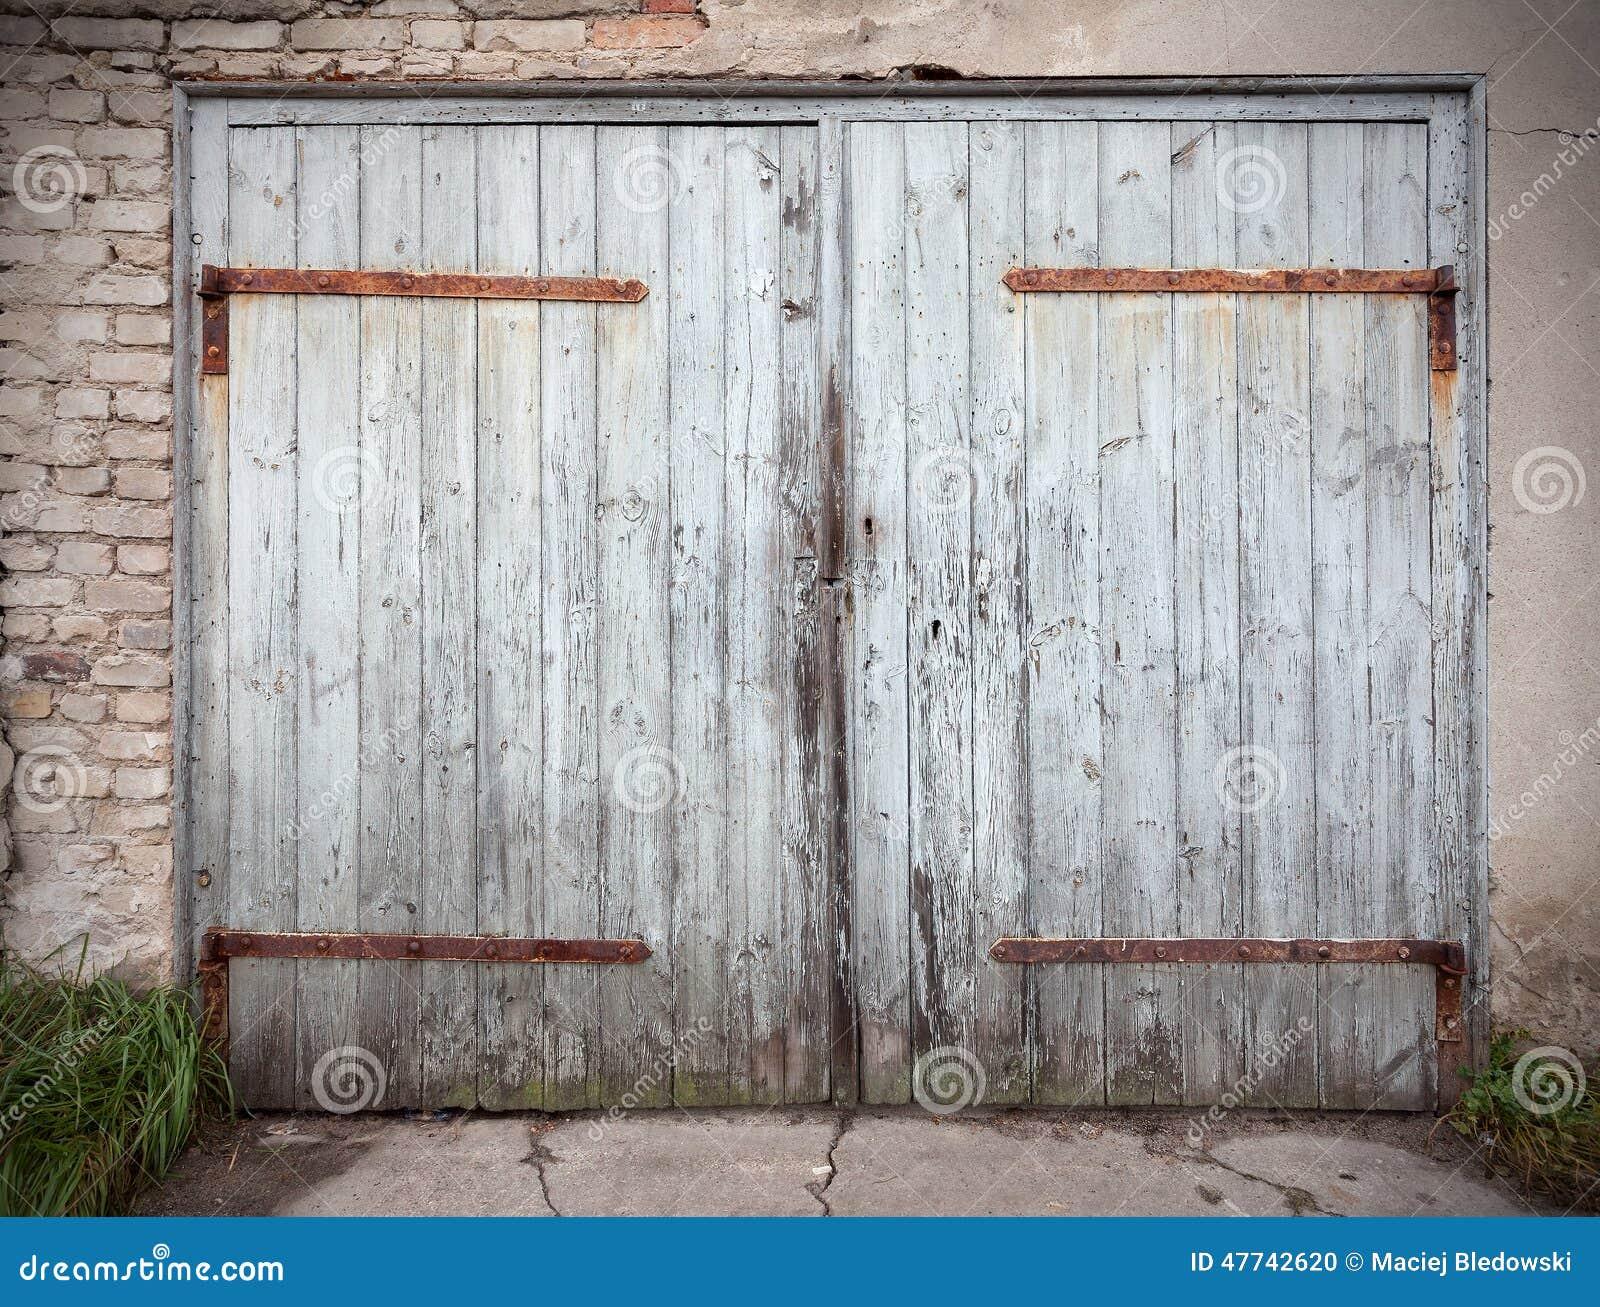 vieille porte n glig e en bois de garage photo stock image 47742620. Black Bedroom Furniture Sets. Home Design Ideas